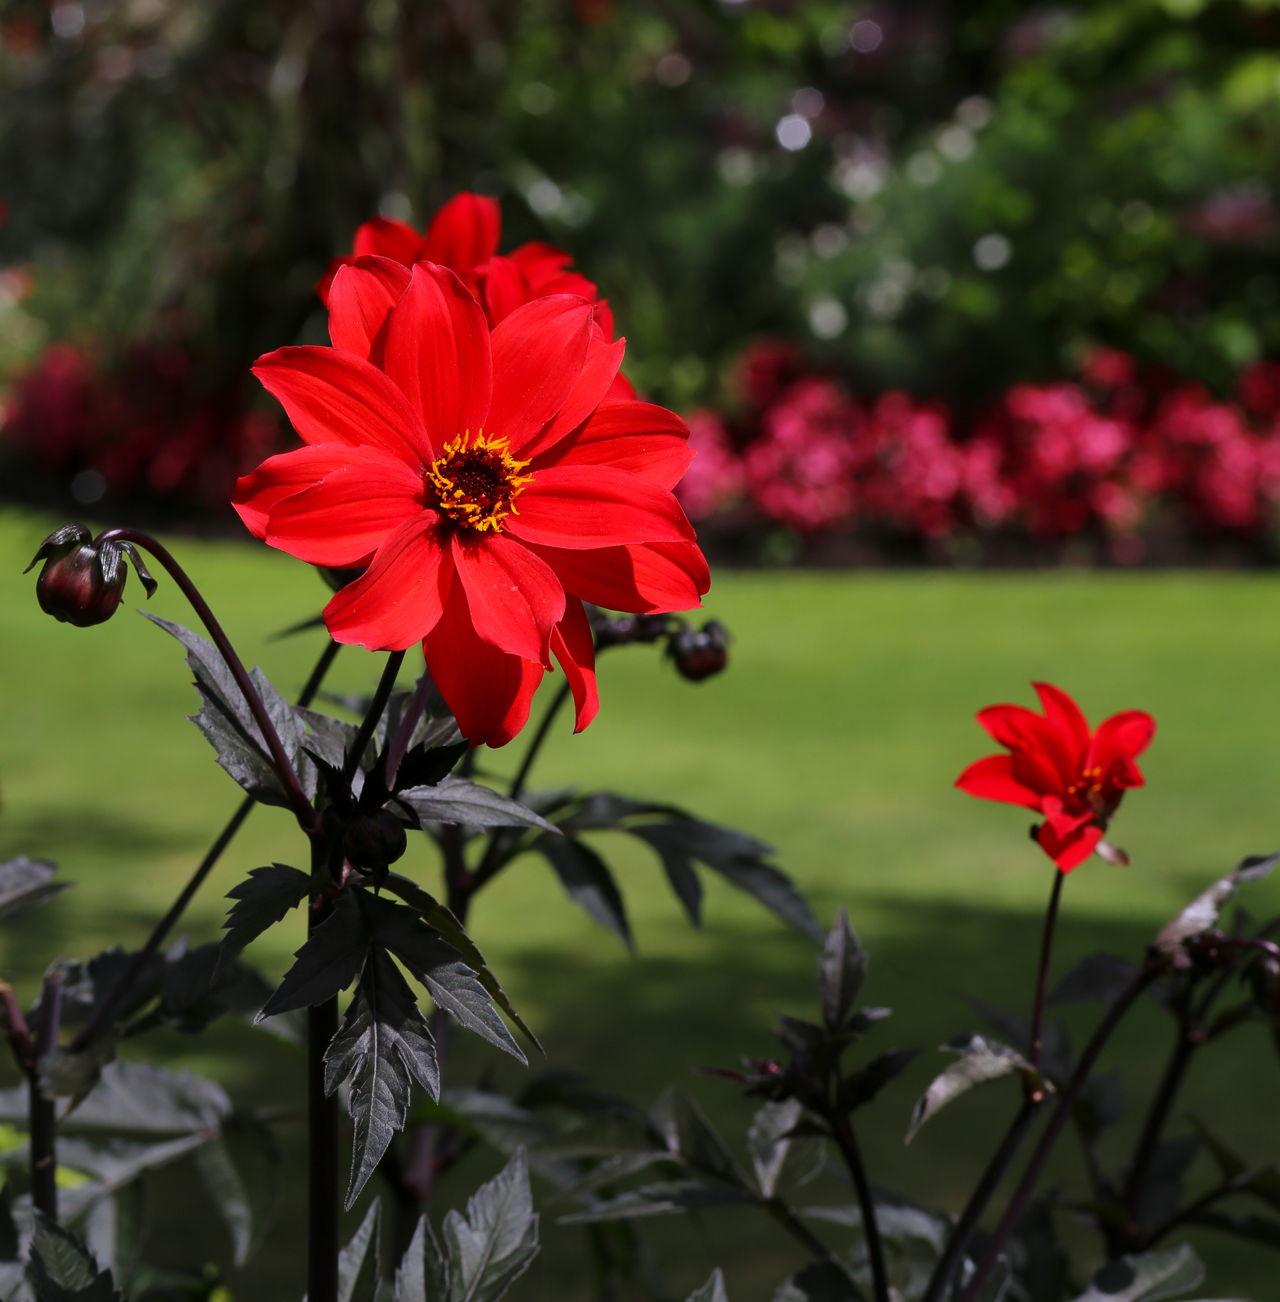 When To Plant Dahlia Bulbs